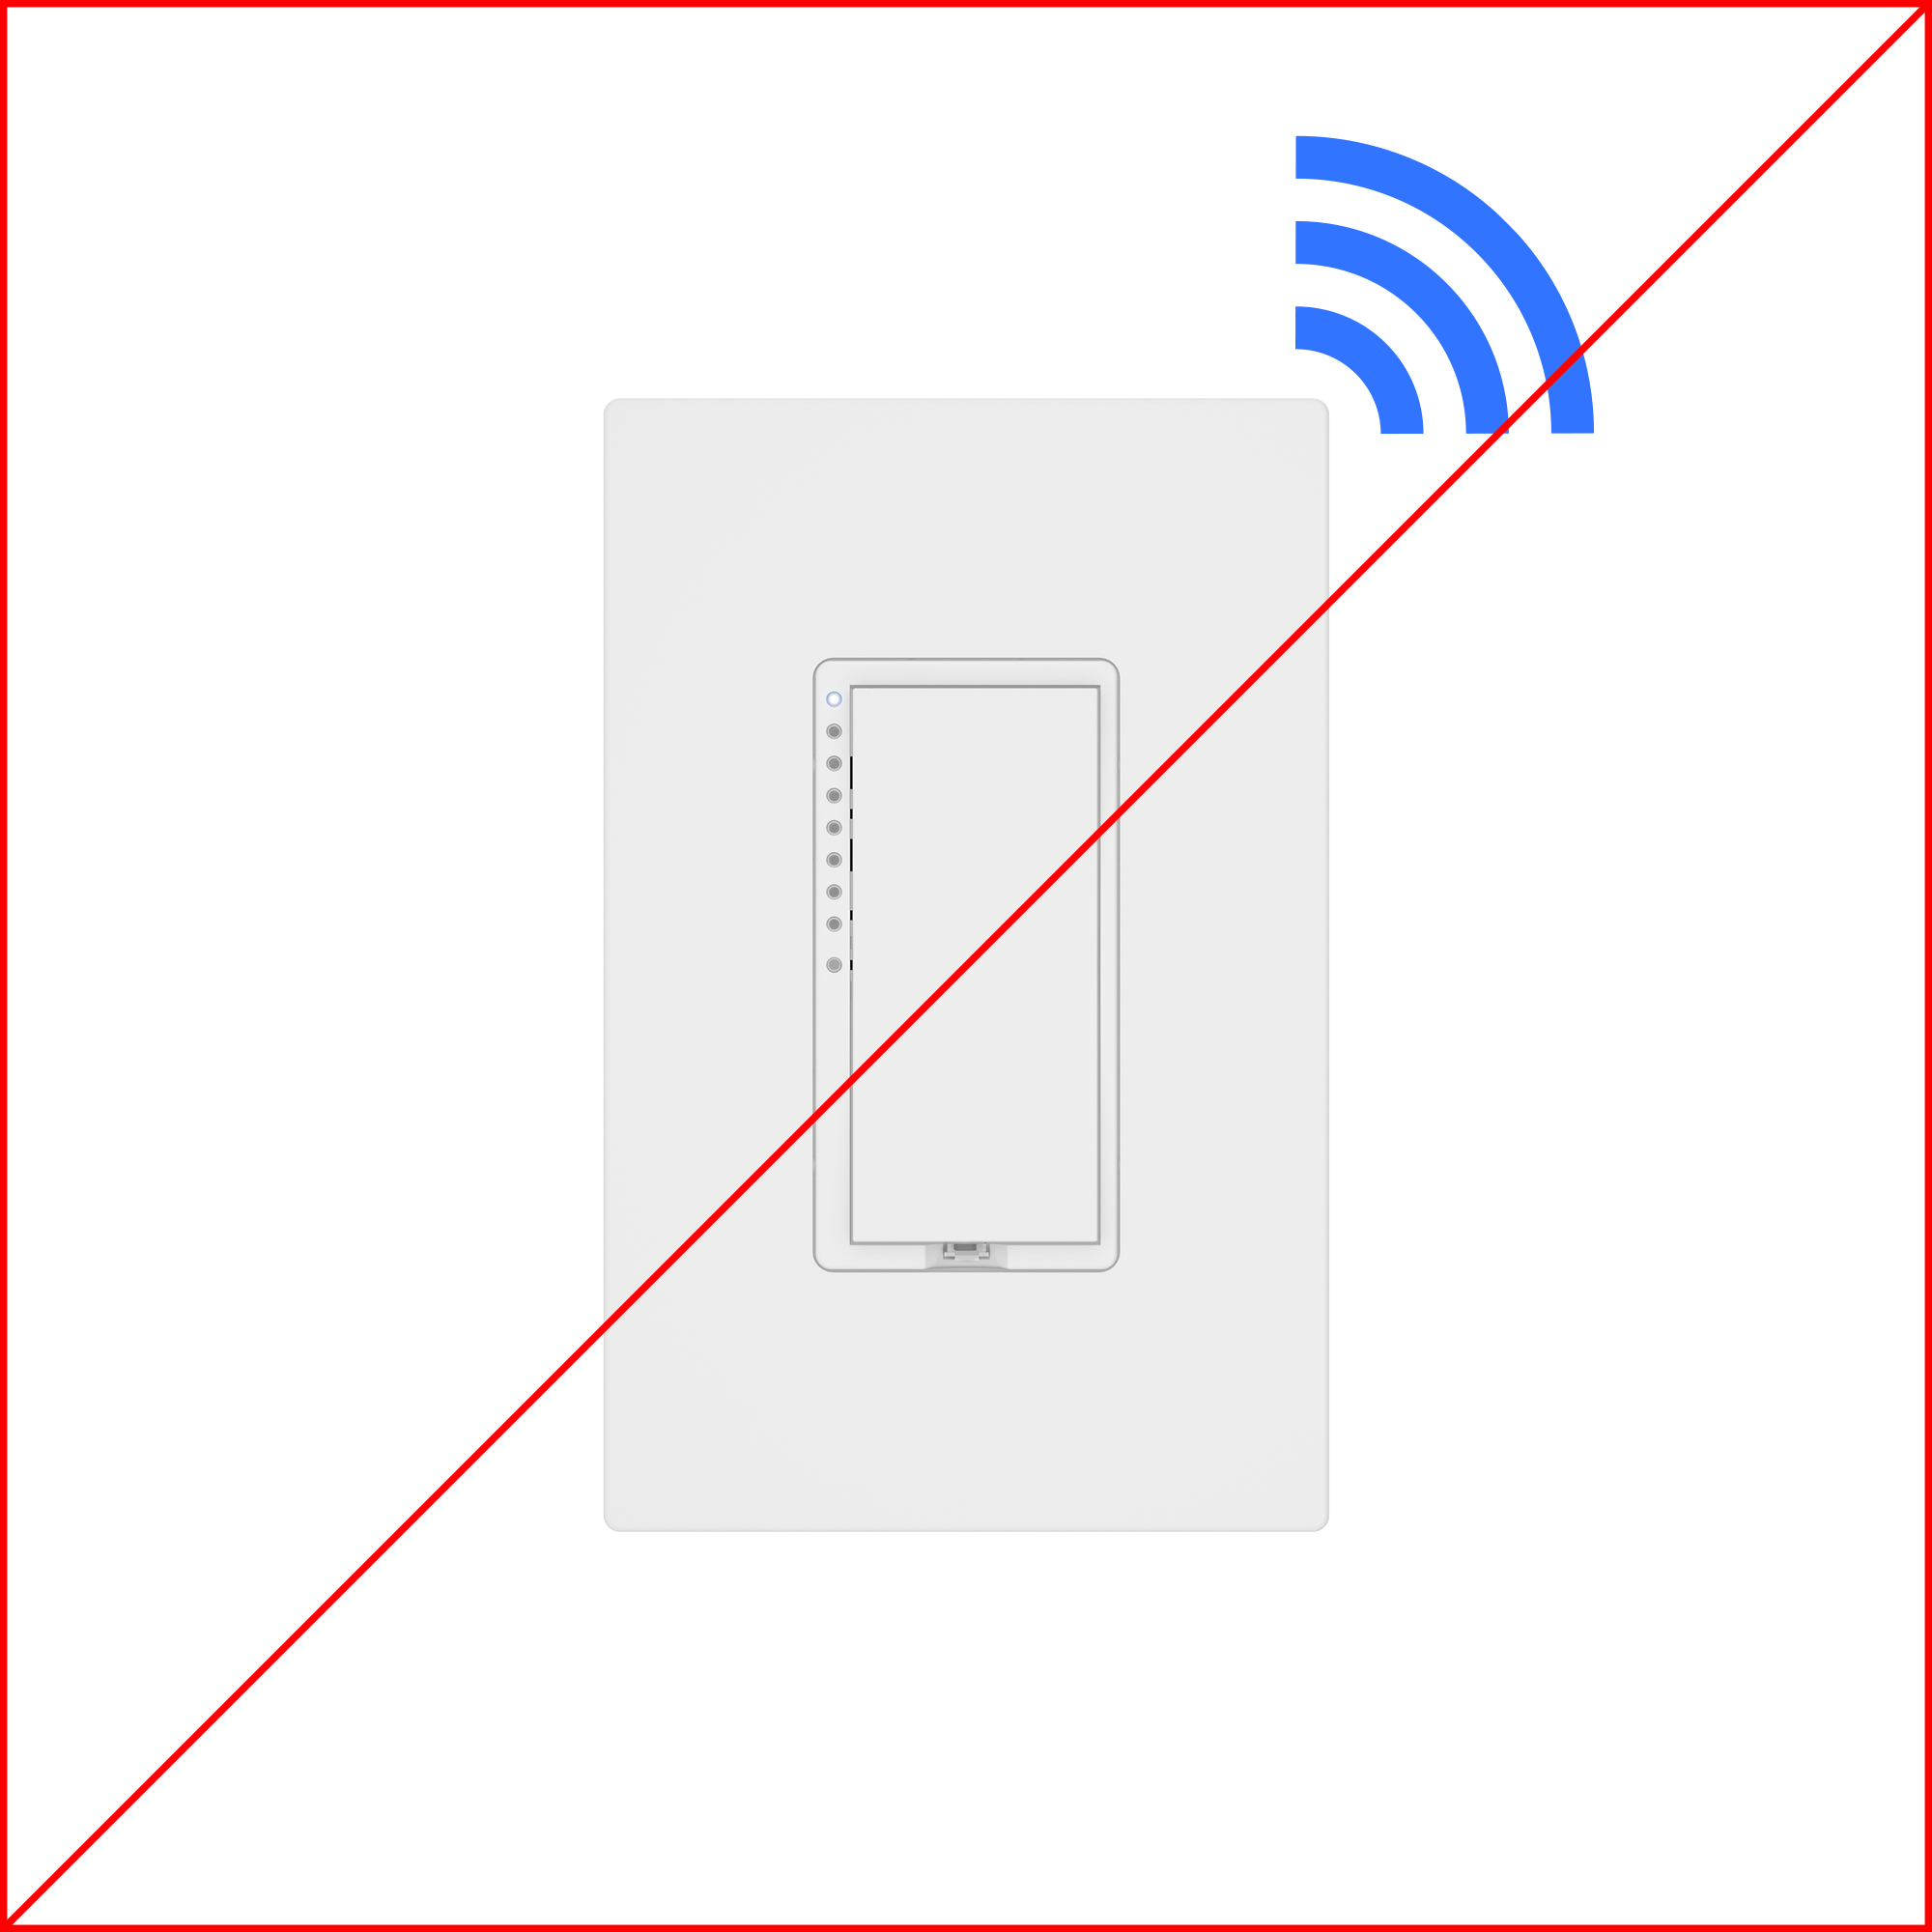 Don't illustrate Insteon technology